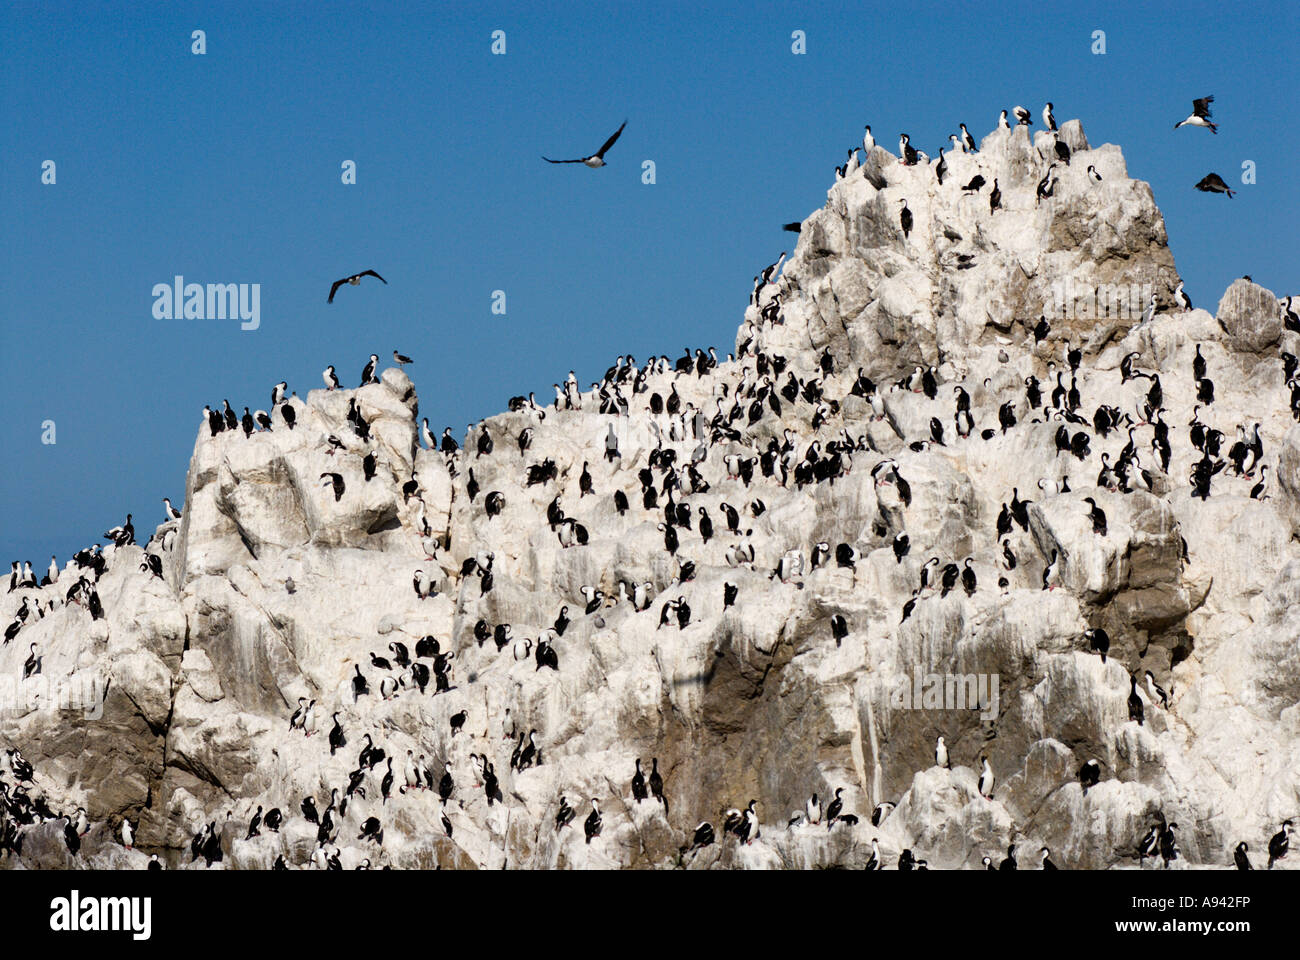 Cormorant Colony at Cabo Blanco, Patagonia, Santa Cruz, Argentina - Stock Image